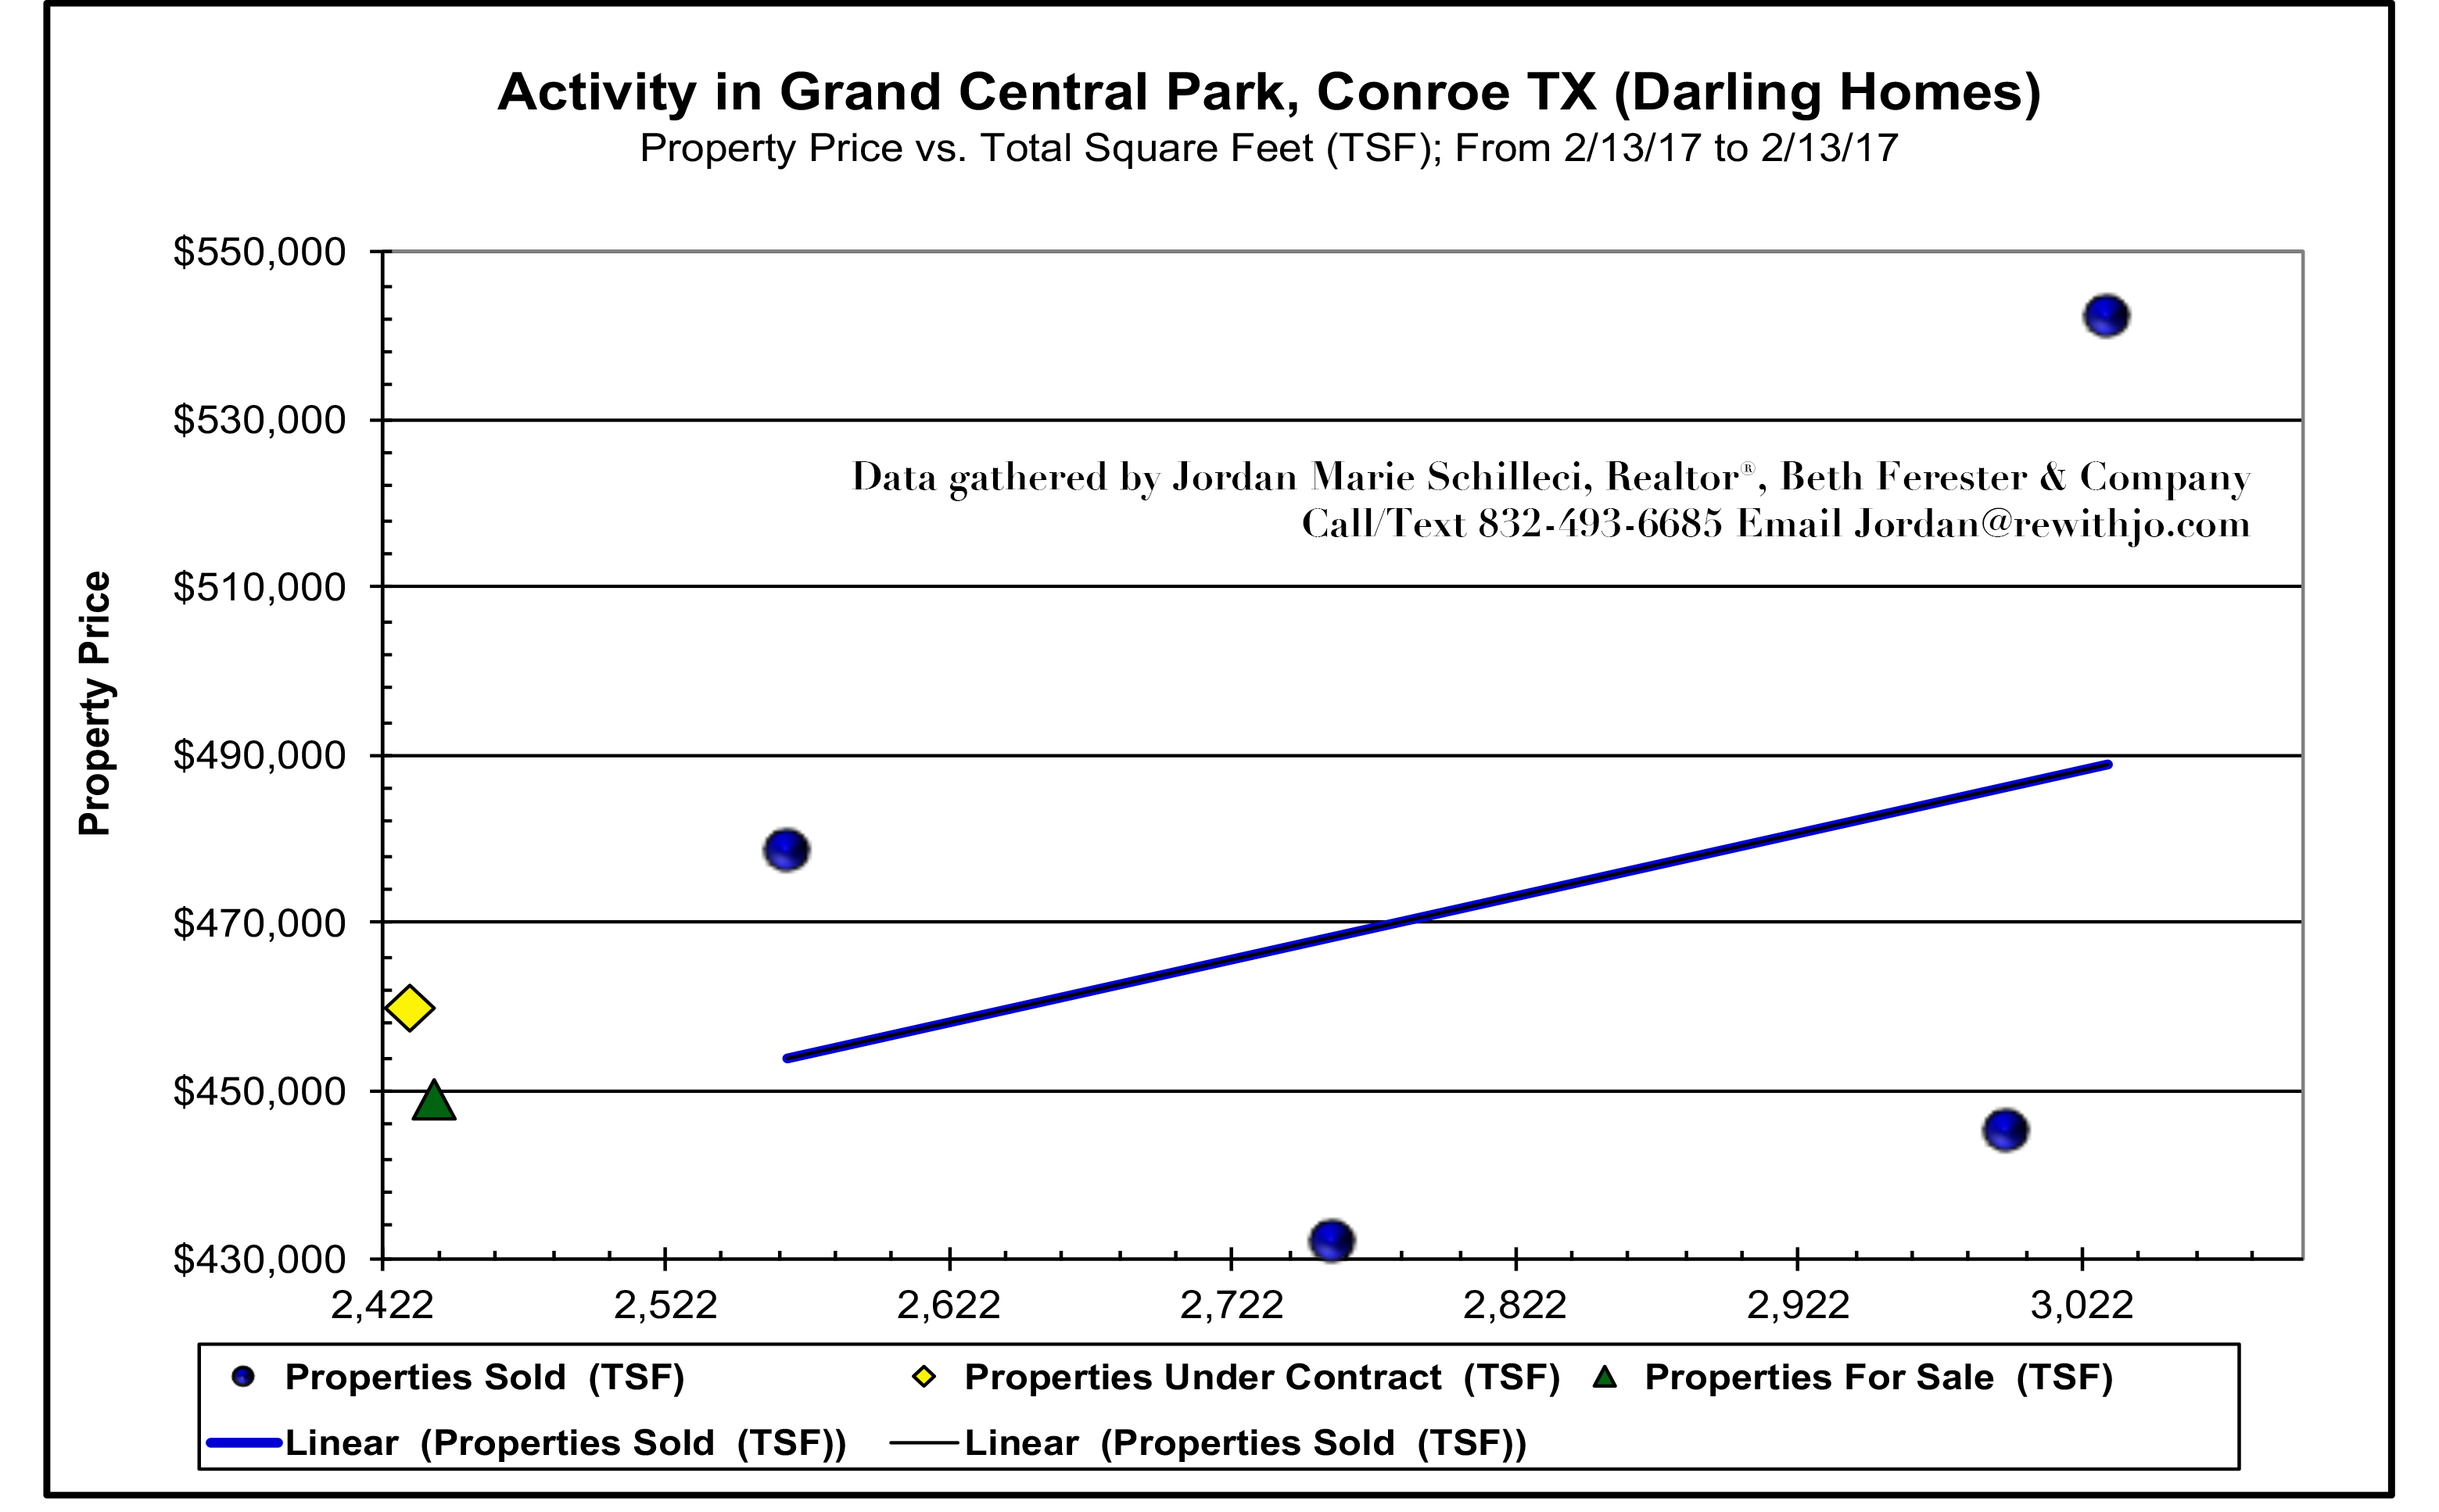 Darling Homes - Homes sold in Grand Central Park - October 2017